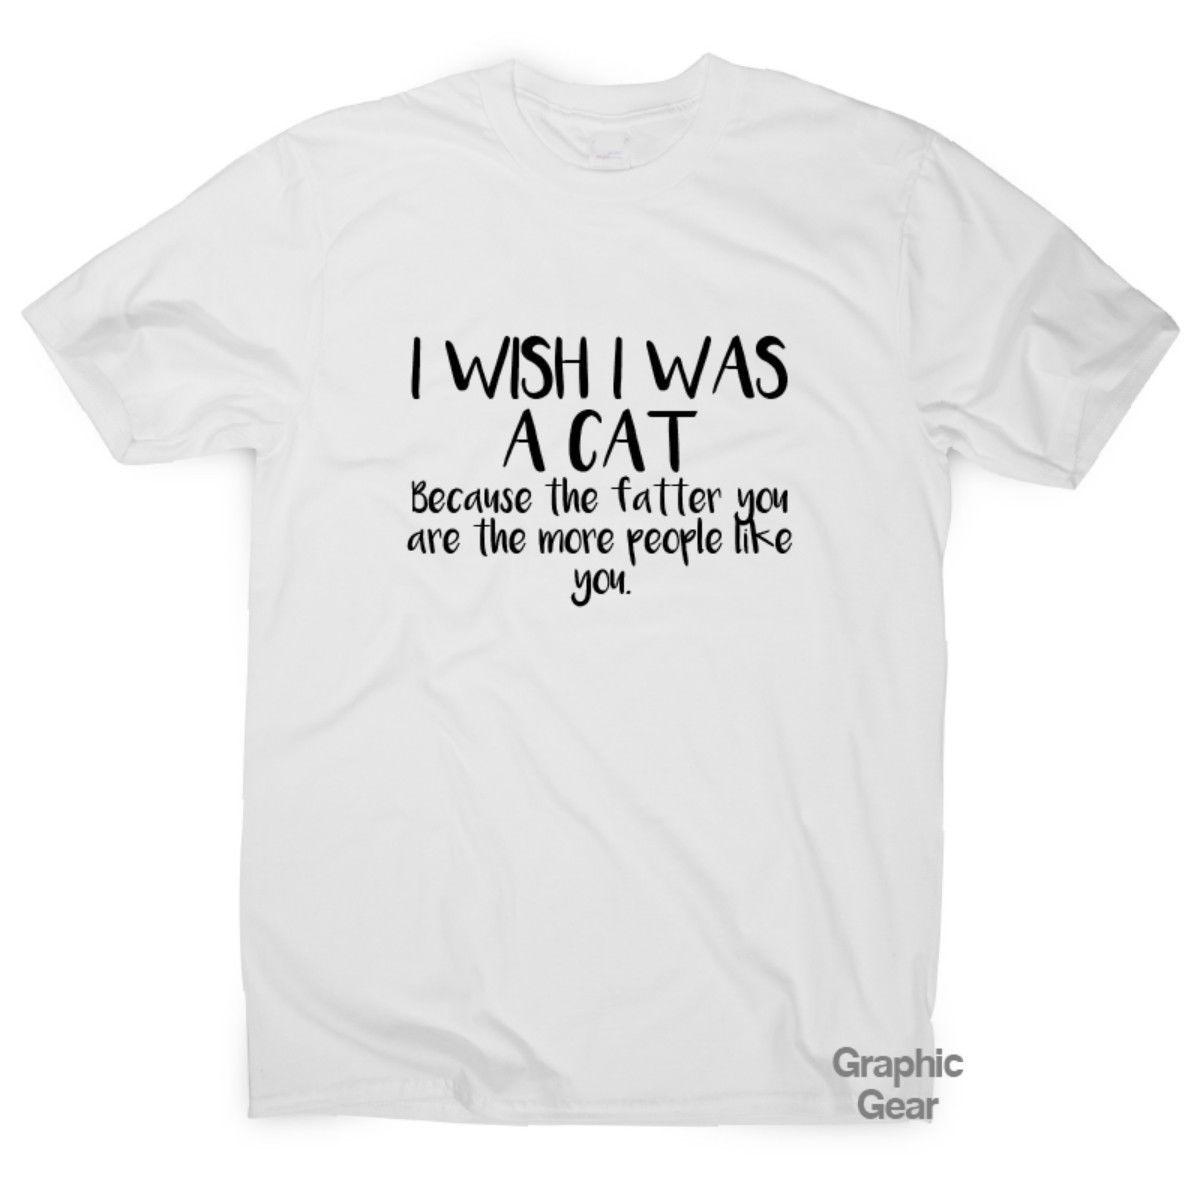 f2742c3a9a3c I Wish I Was A Cat - Funny Gym T Shirt Gift Mens Womens Fitness Tee Novelty  T Shirt Men Man's Online Designer Short Sleeve Fashion Custom Pl